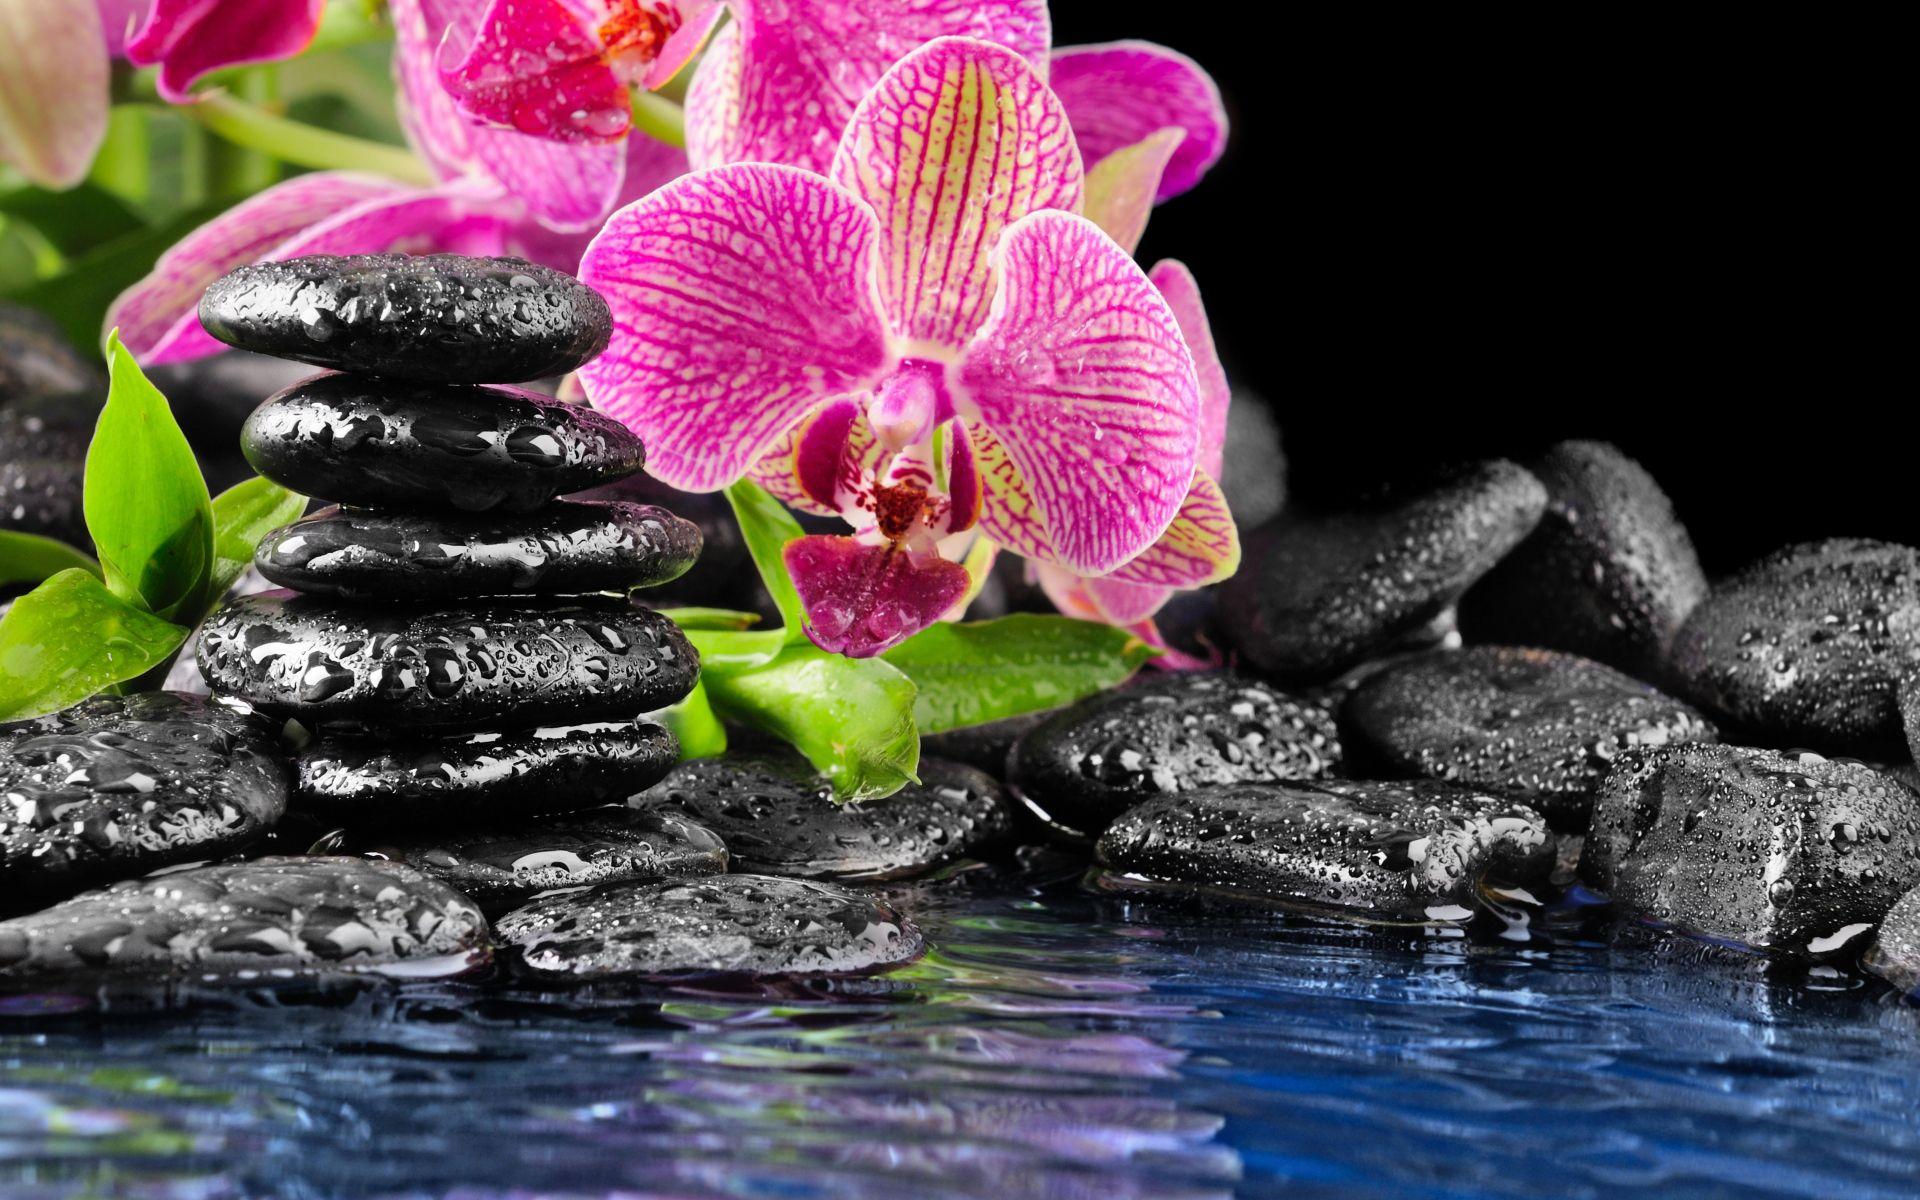 Religieux zen fond d 39 cran others pinterest for Photo ecran zen